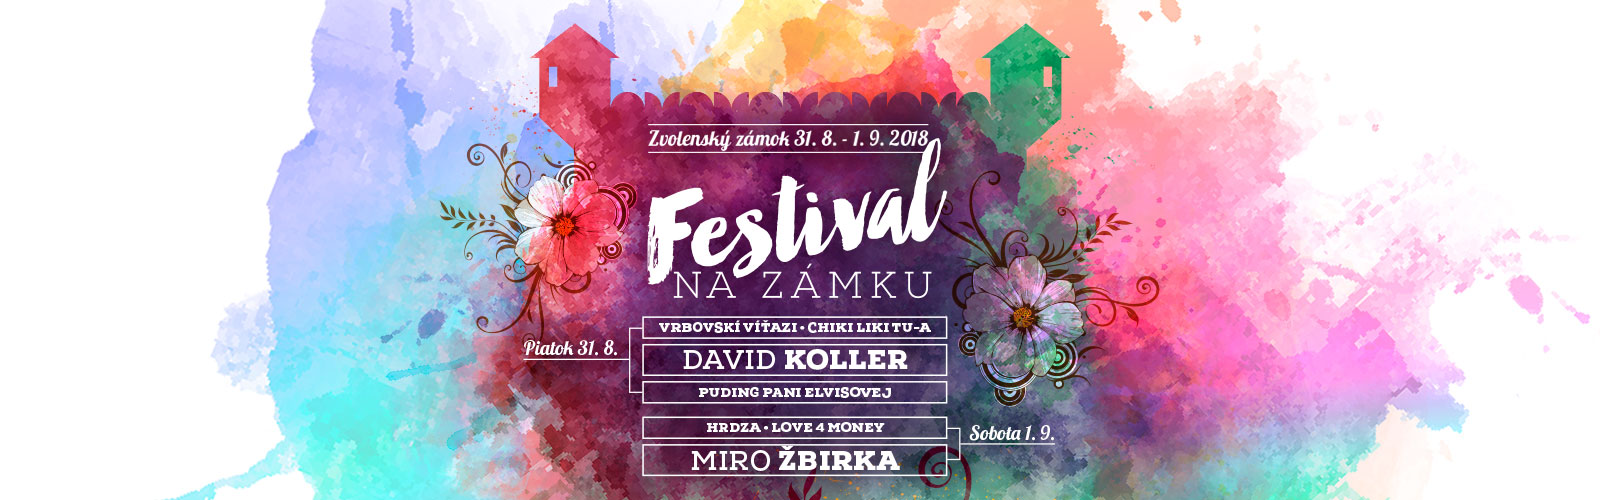 festival_zamku